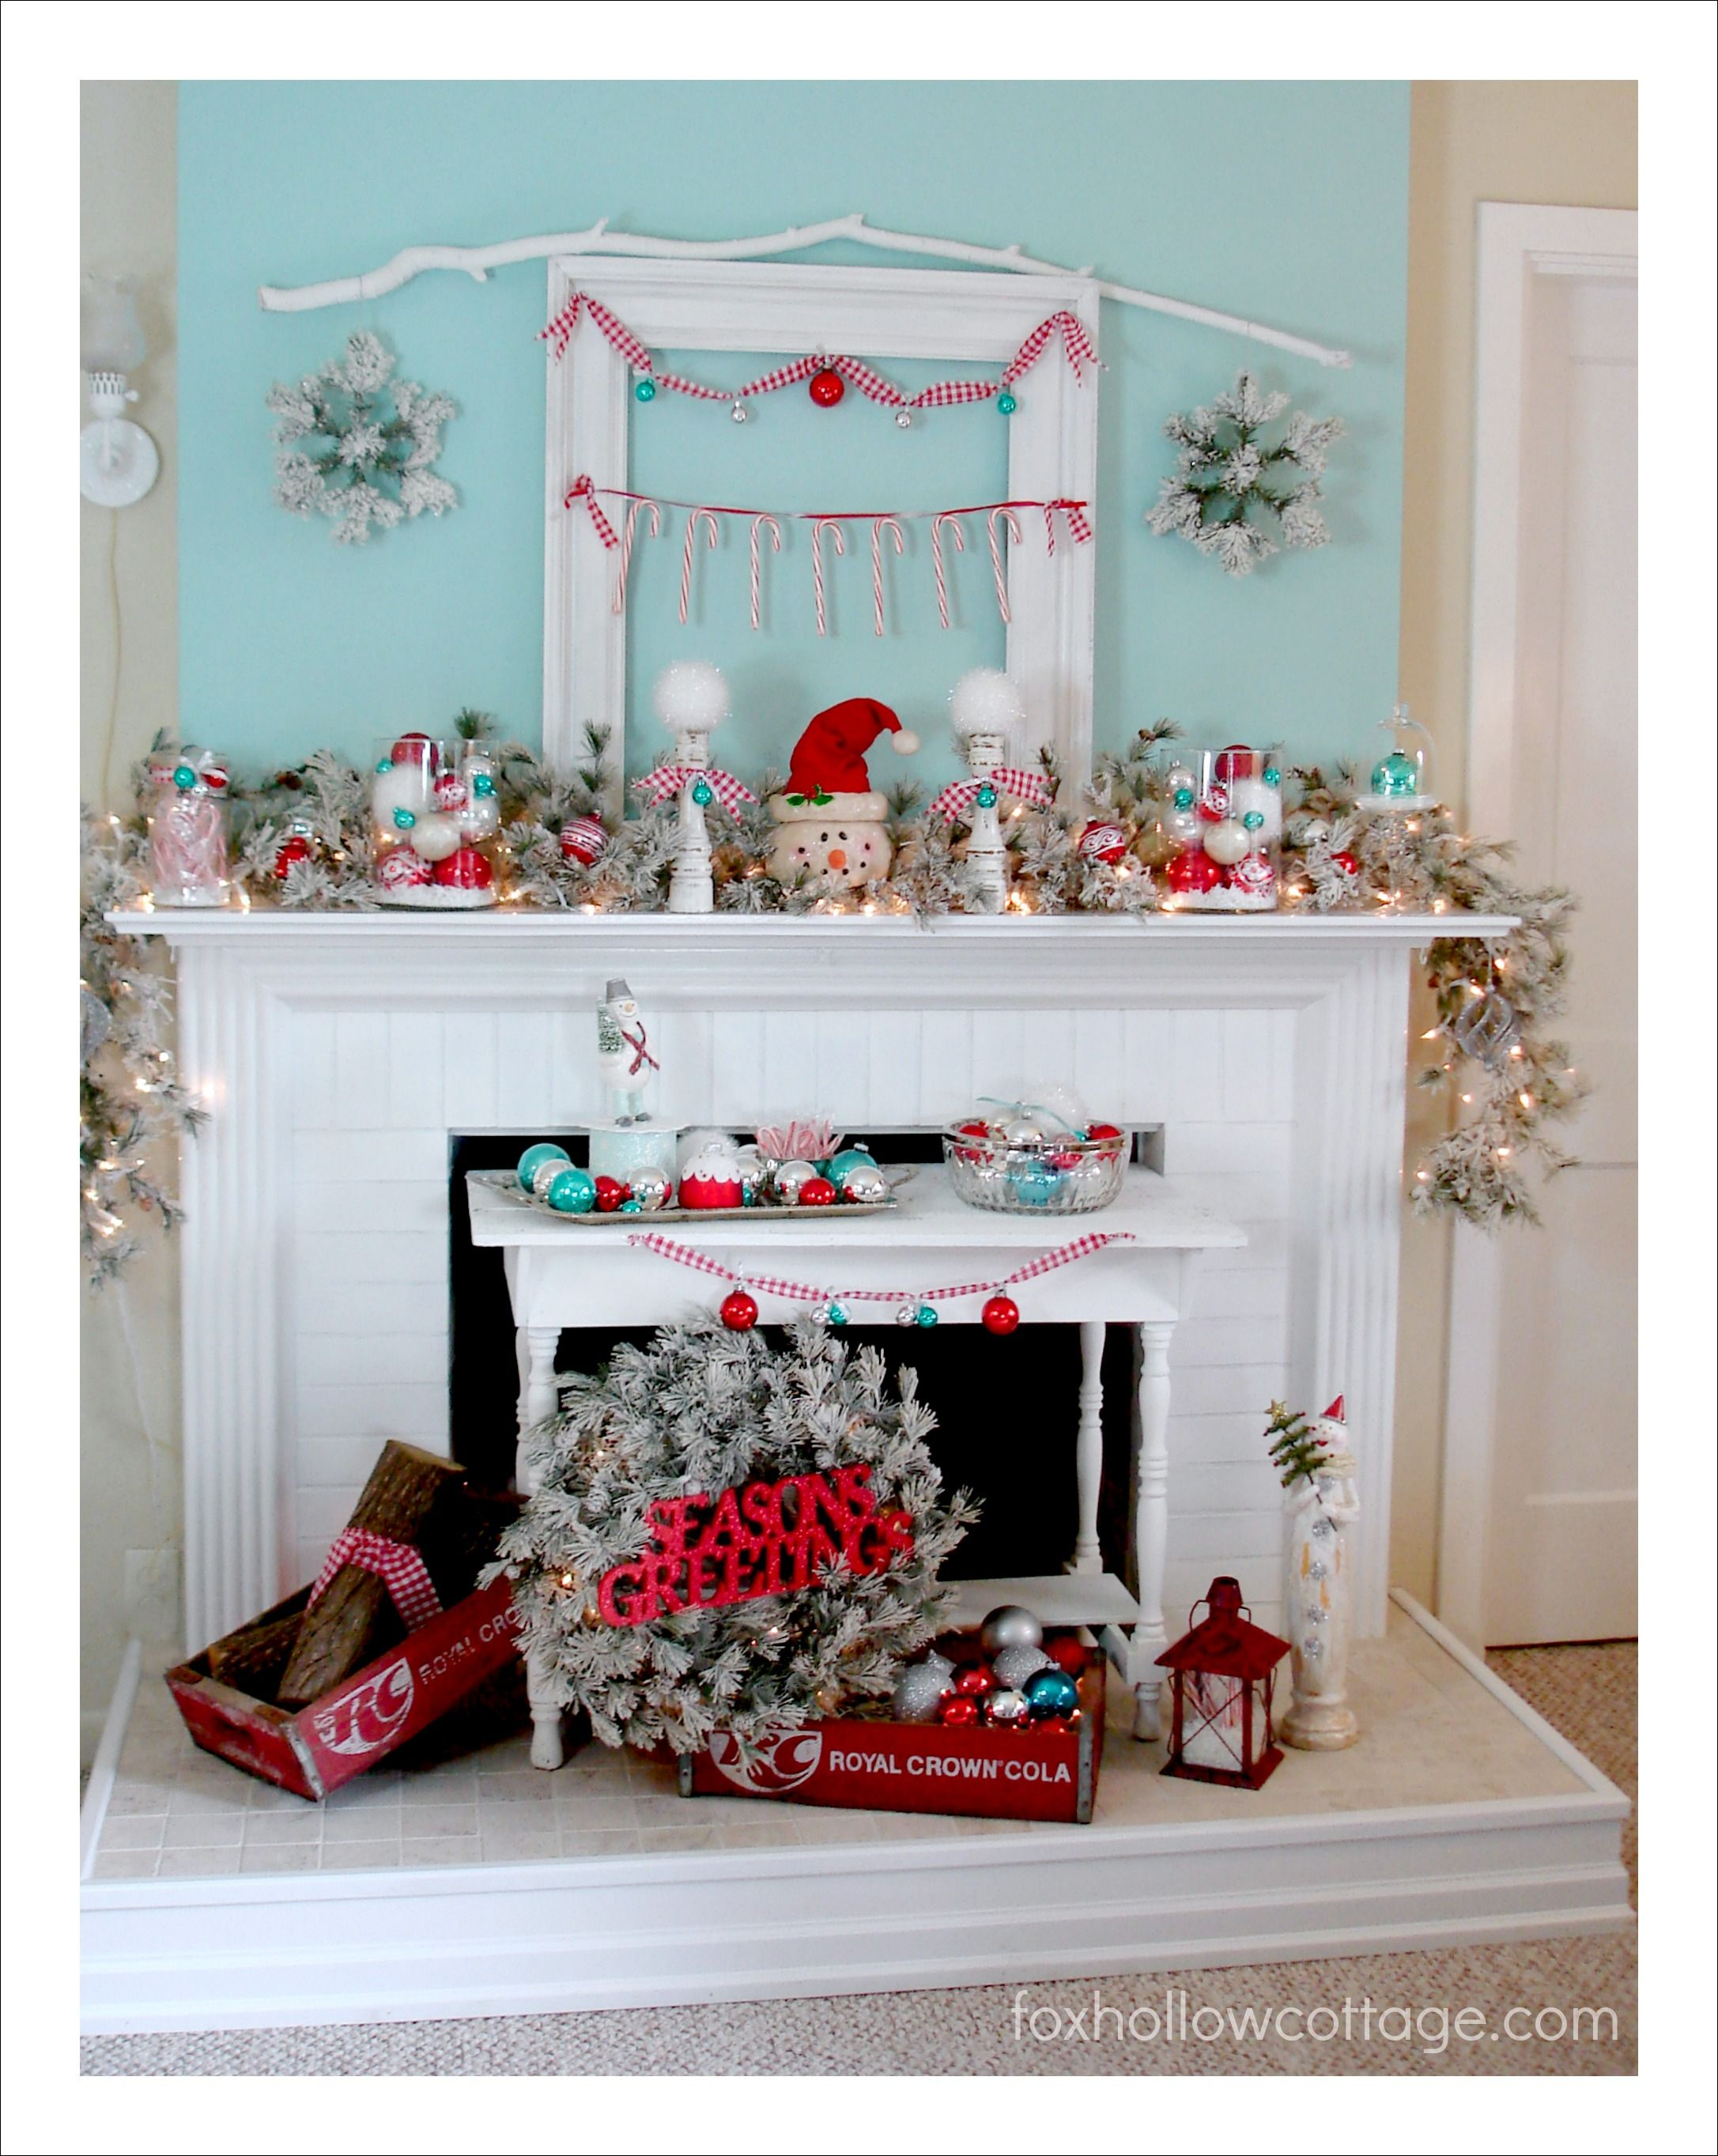 Vintage Christmas Mantel Decorations : Vintage cottage christmas mantel for the home